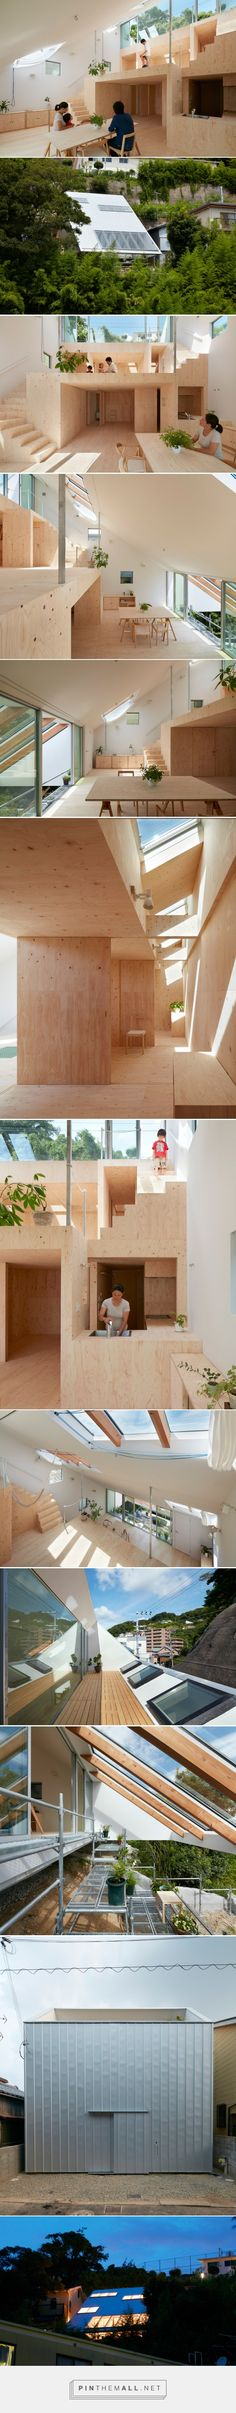 tomohiro hata's hillside house interior integrates terraced platforms - created via https://pinthemall.net